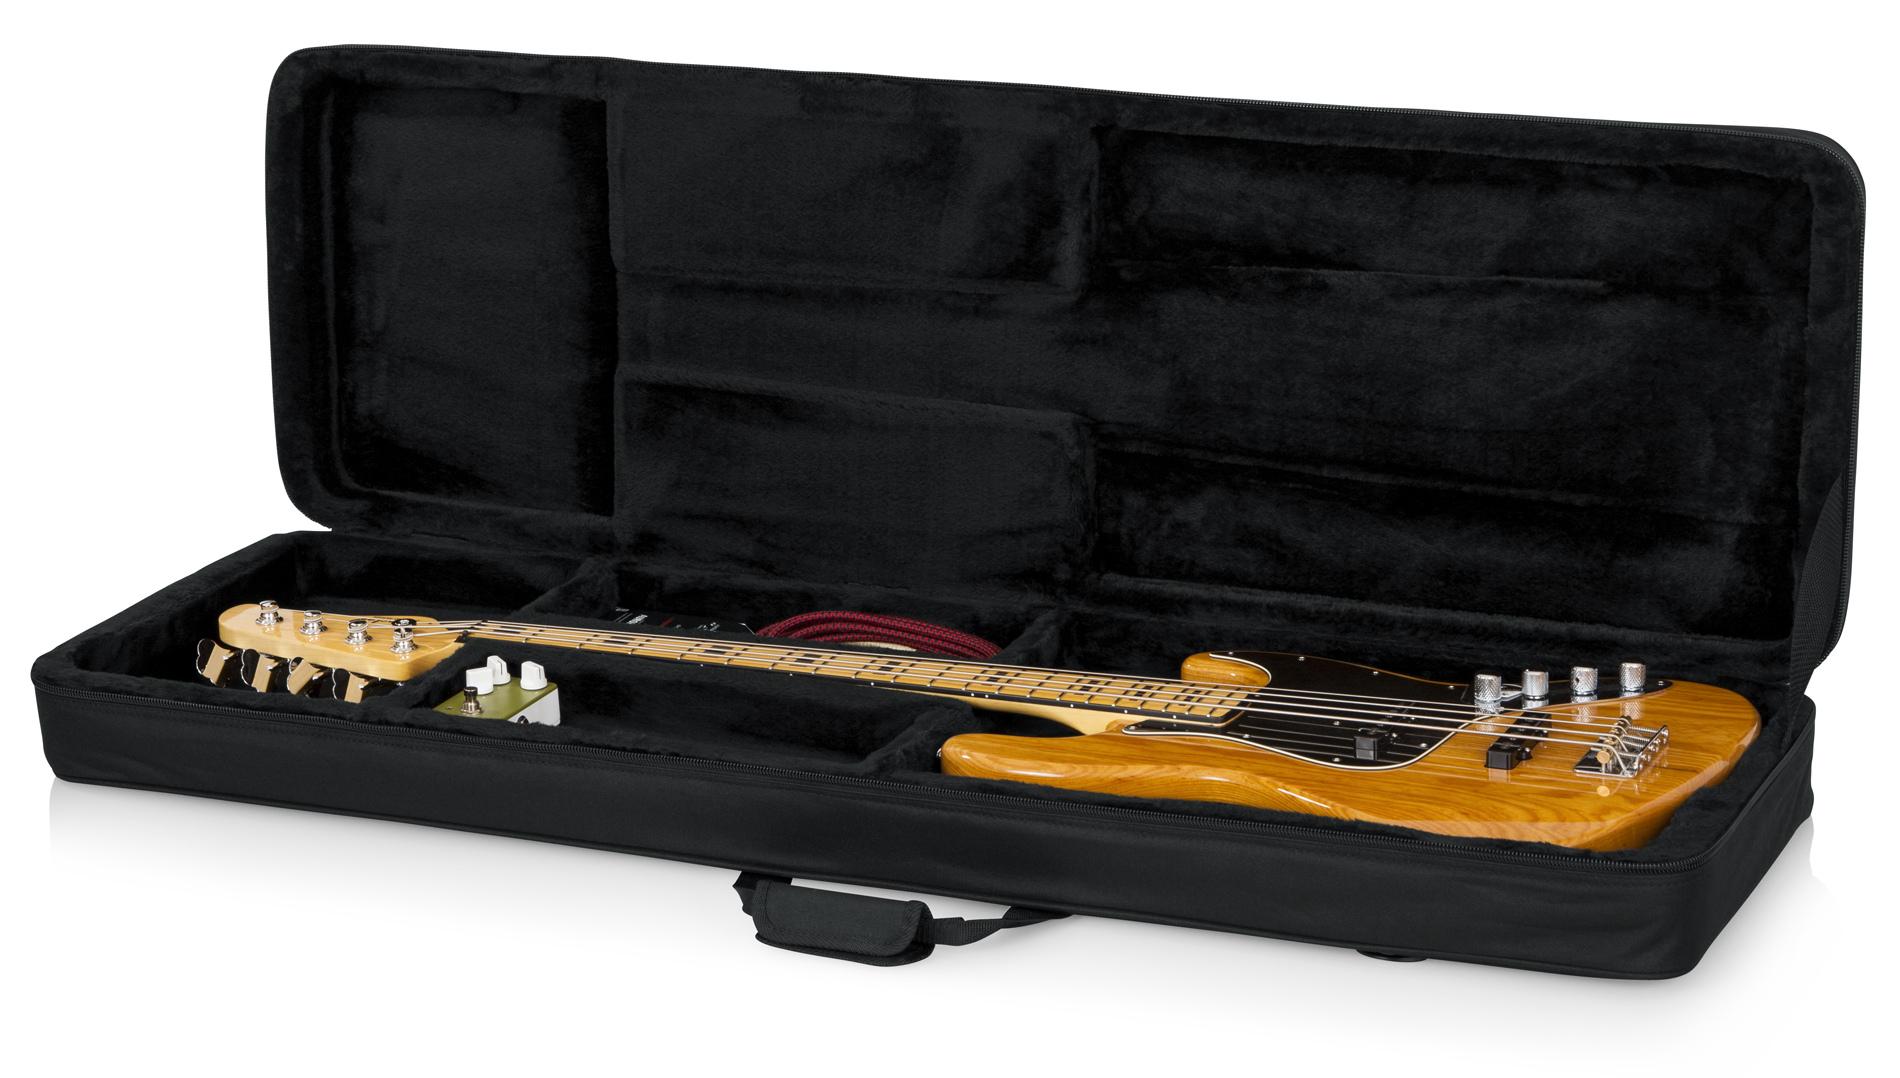 gator gl bass lightweight electric bass guitar case full compass systems. Black Bedroom Furniture Sets. Home Design Ideas